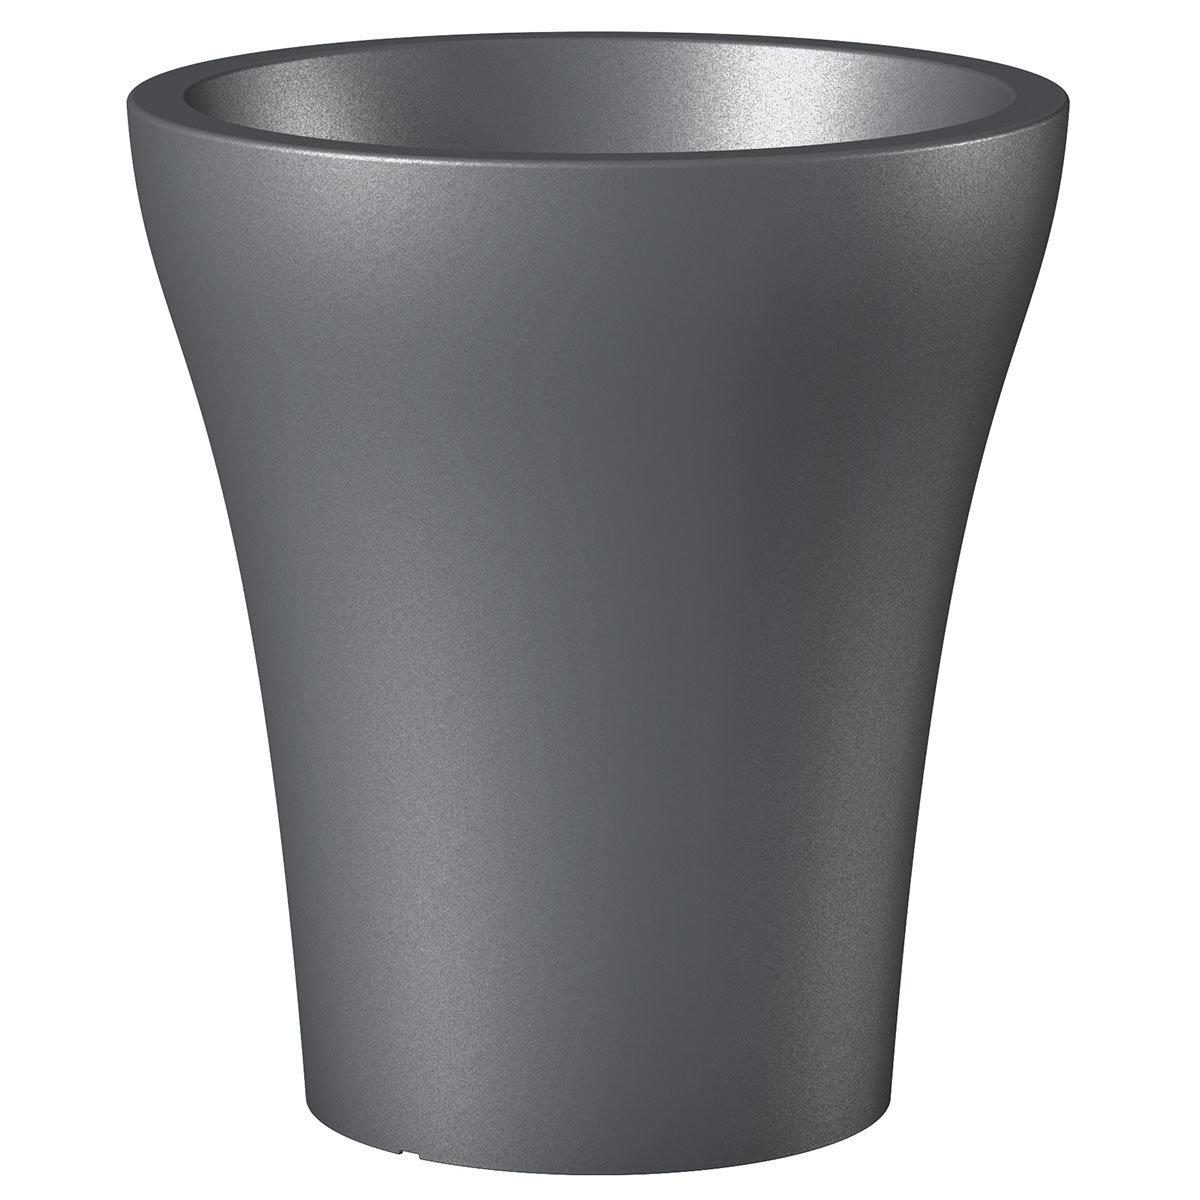 Pflanzkübel No.1 HighStyle, 32 cm, Metallic Grey